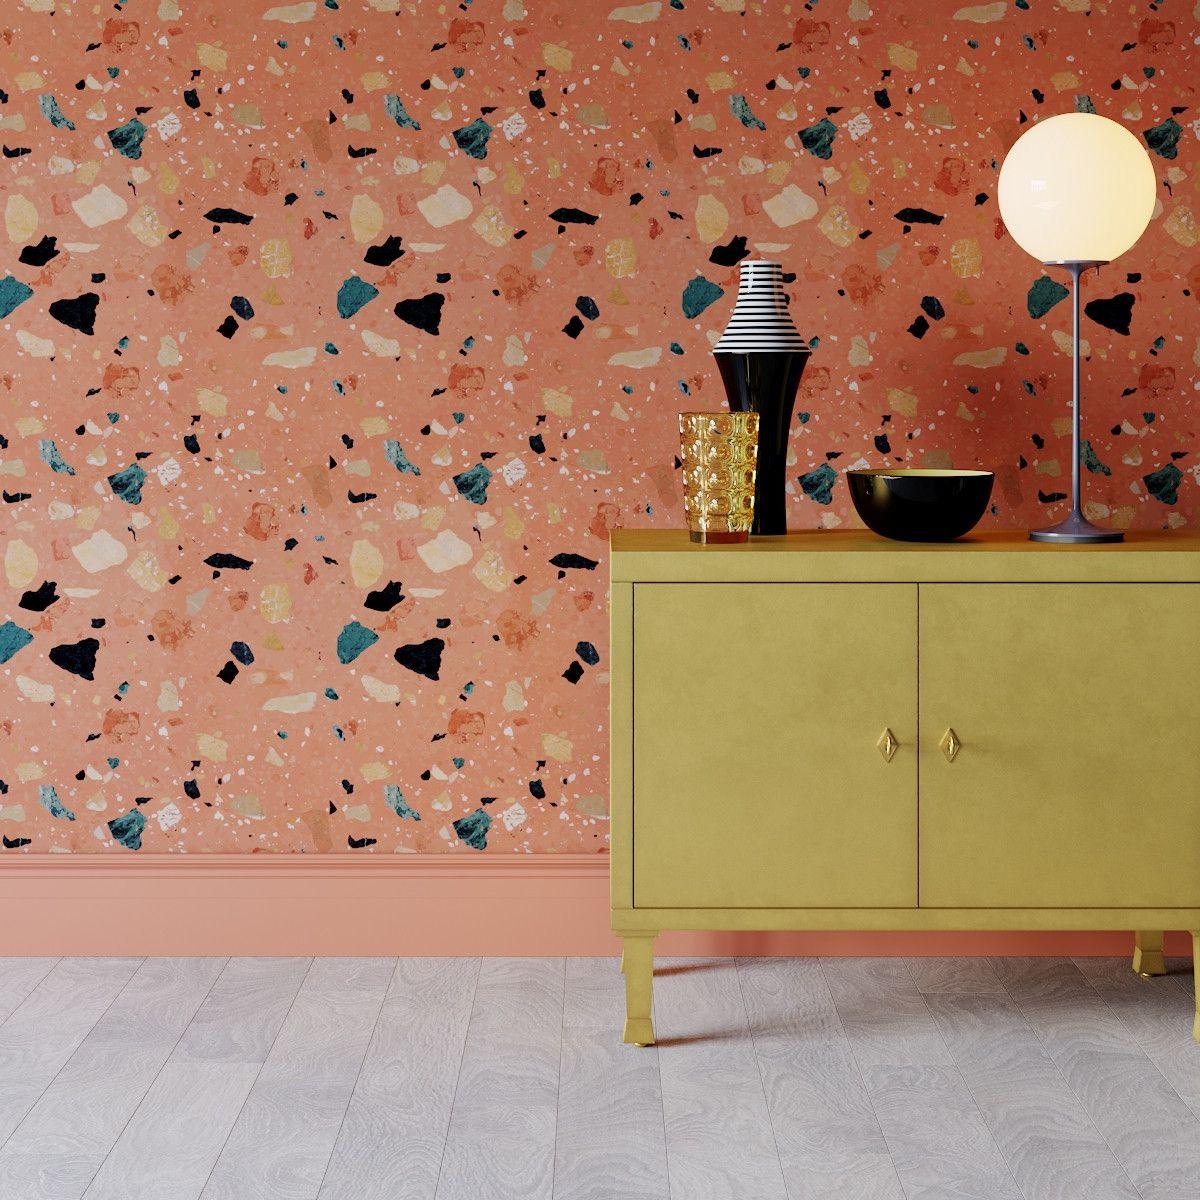 Peel and Stick Wallpaper Roll | Terracotta Sperduti